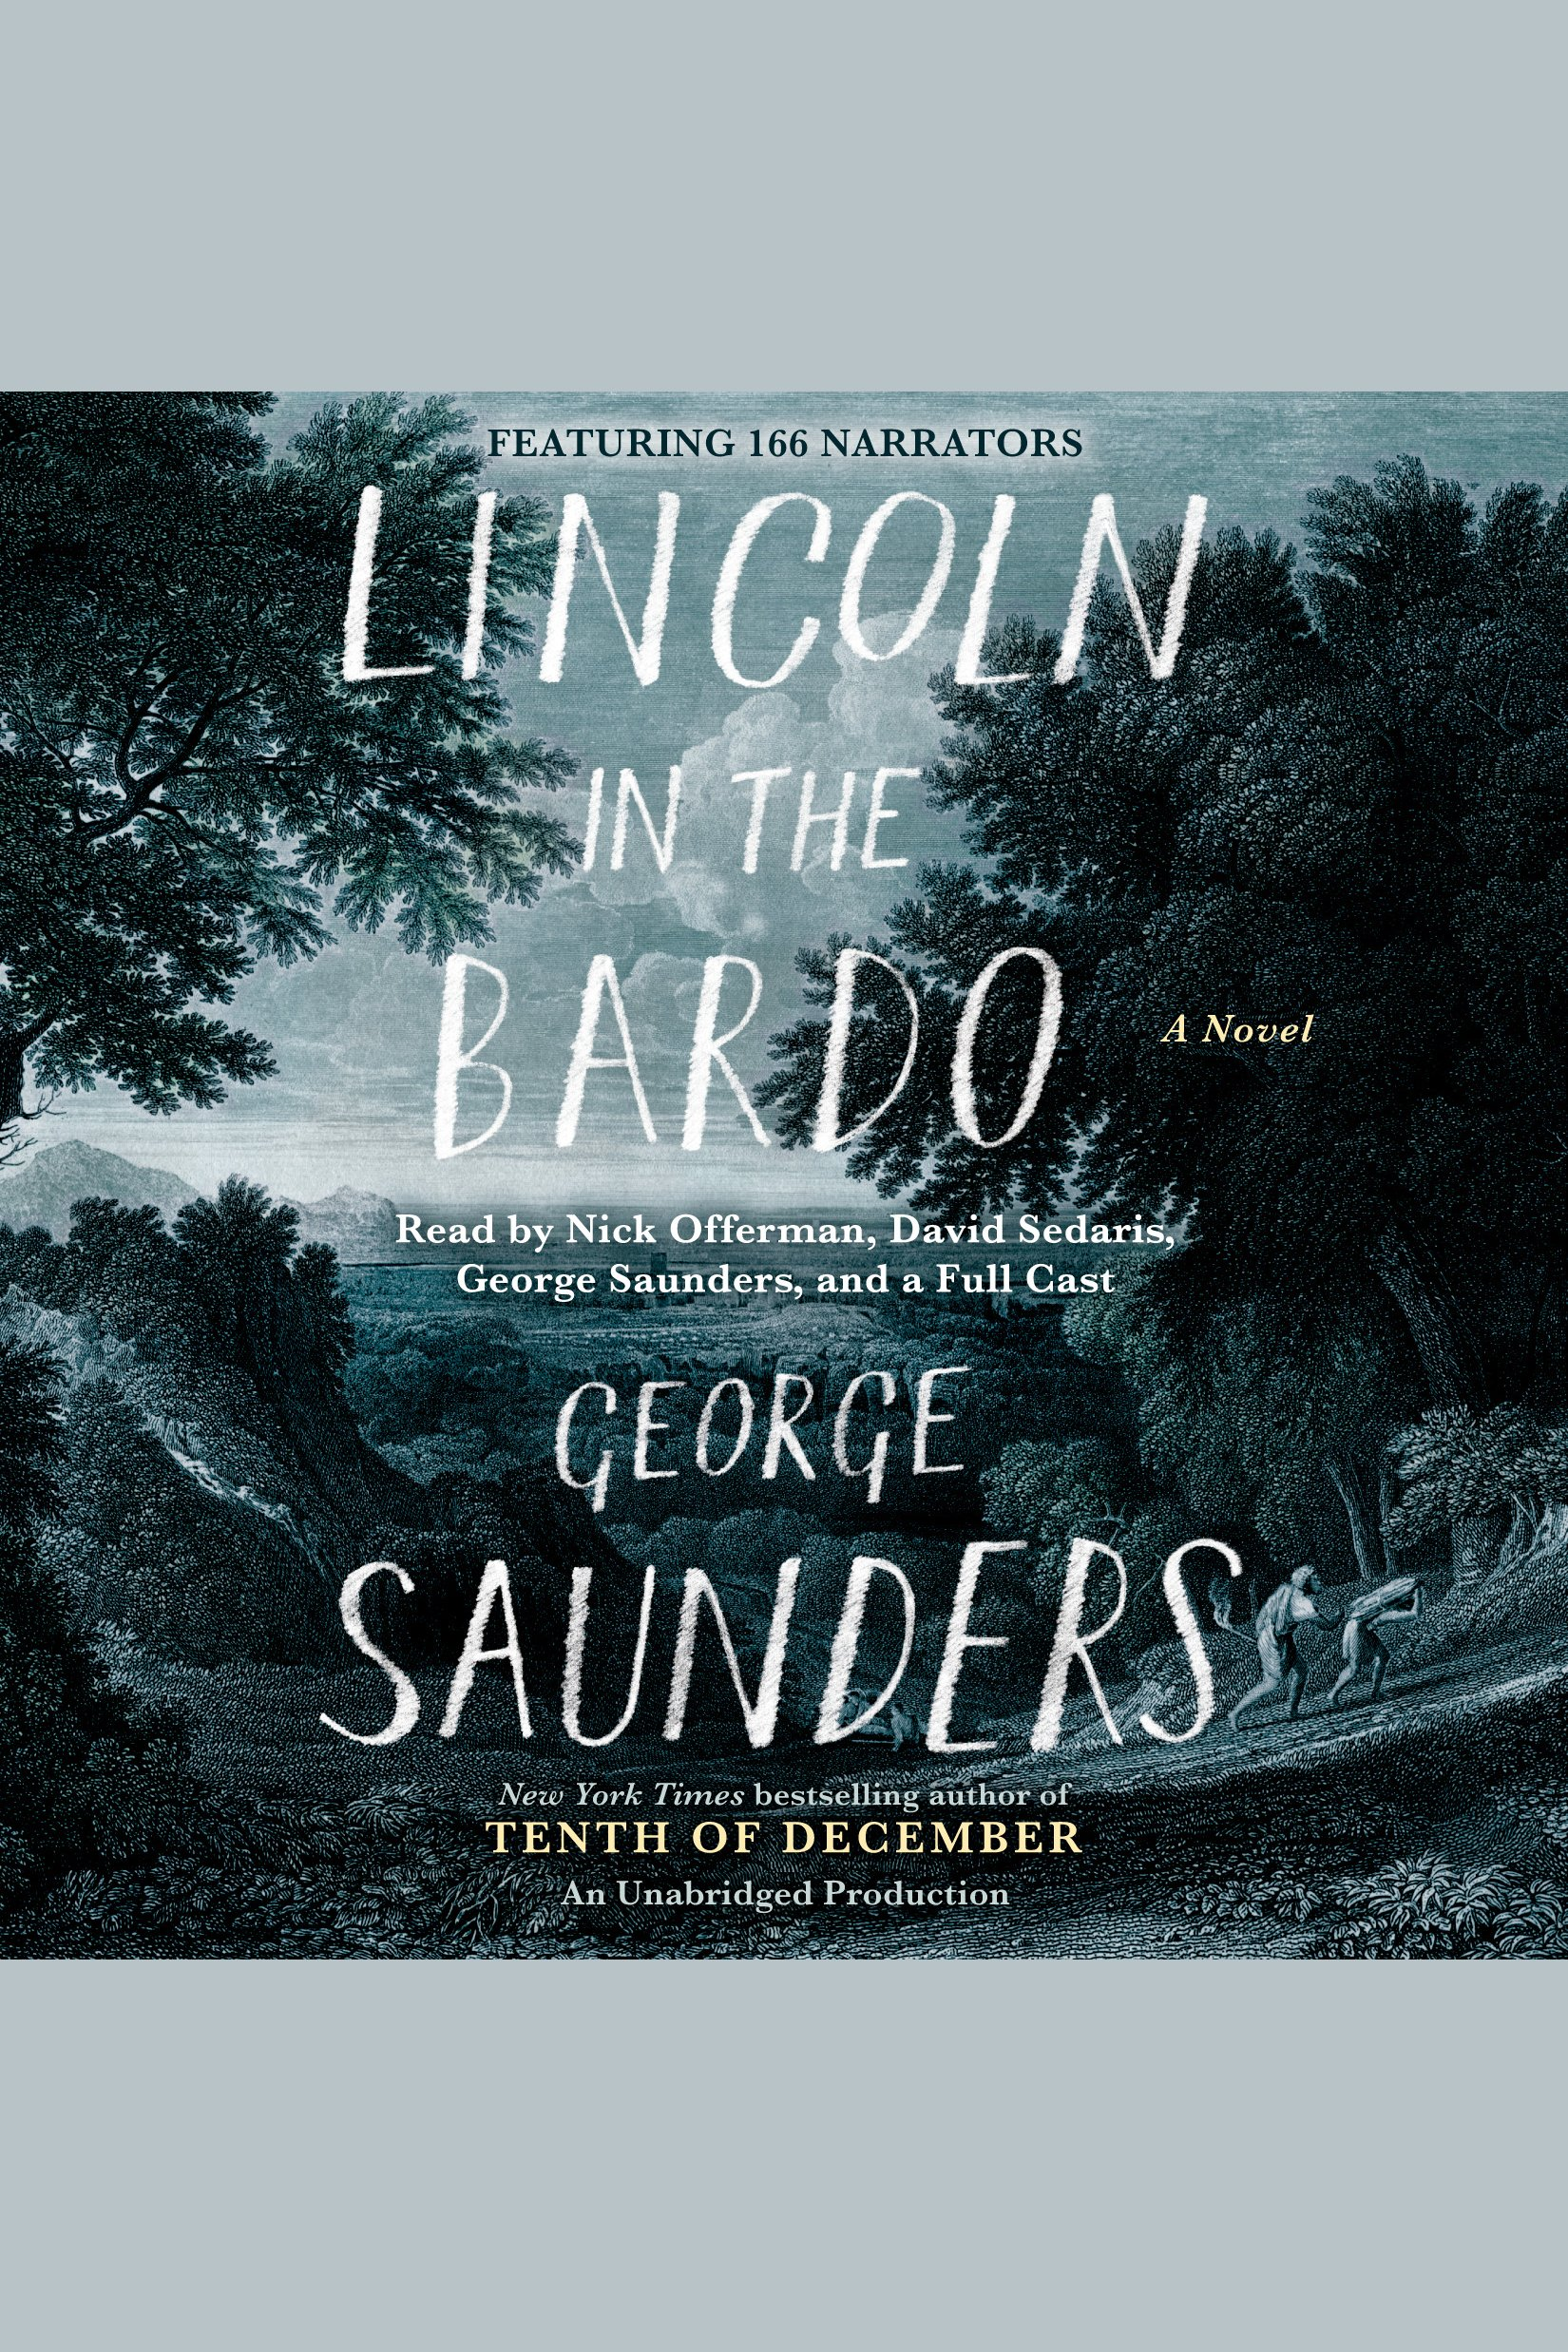 Lincoln in the bardo [AudioEbook] : a novel